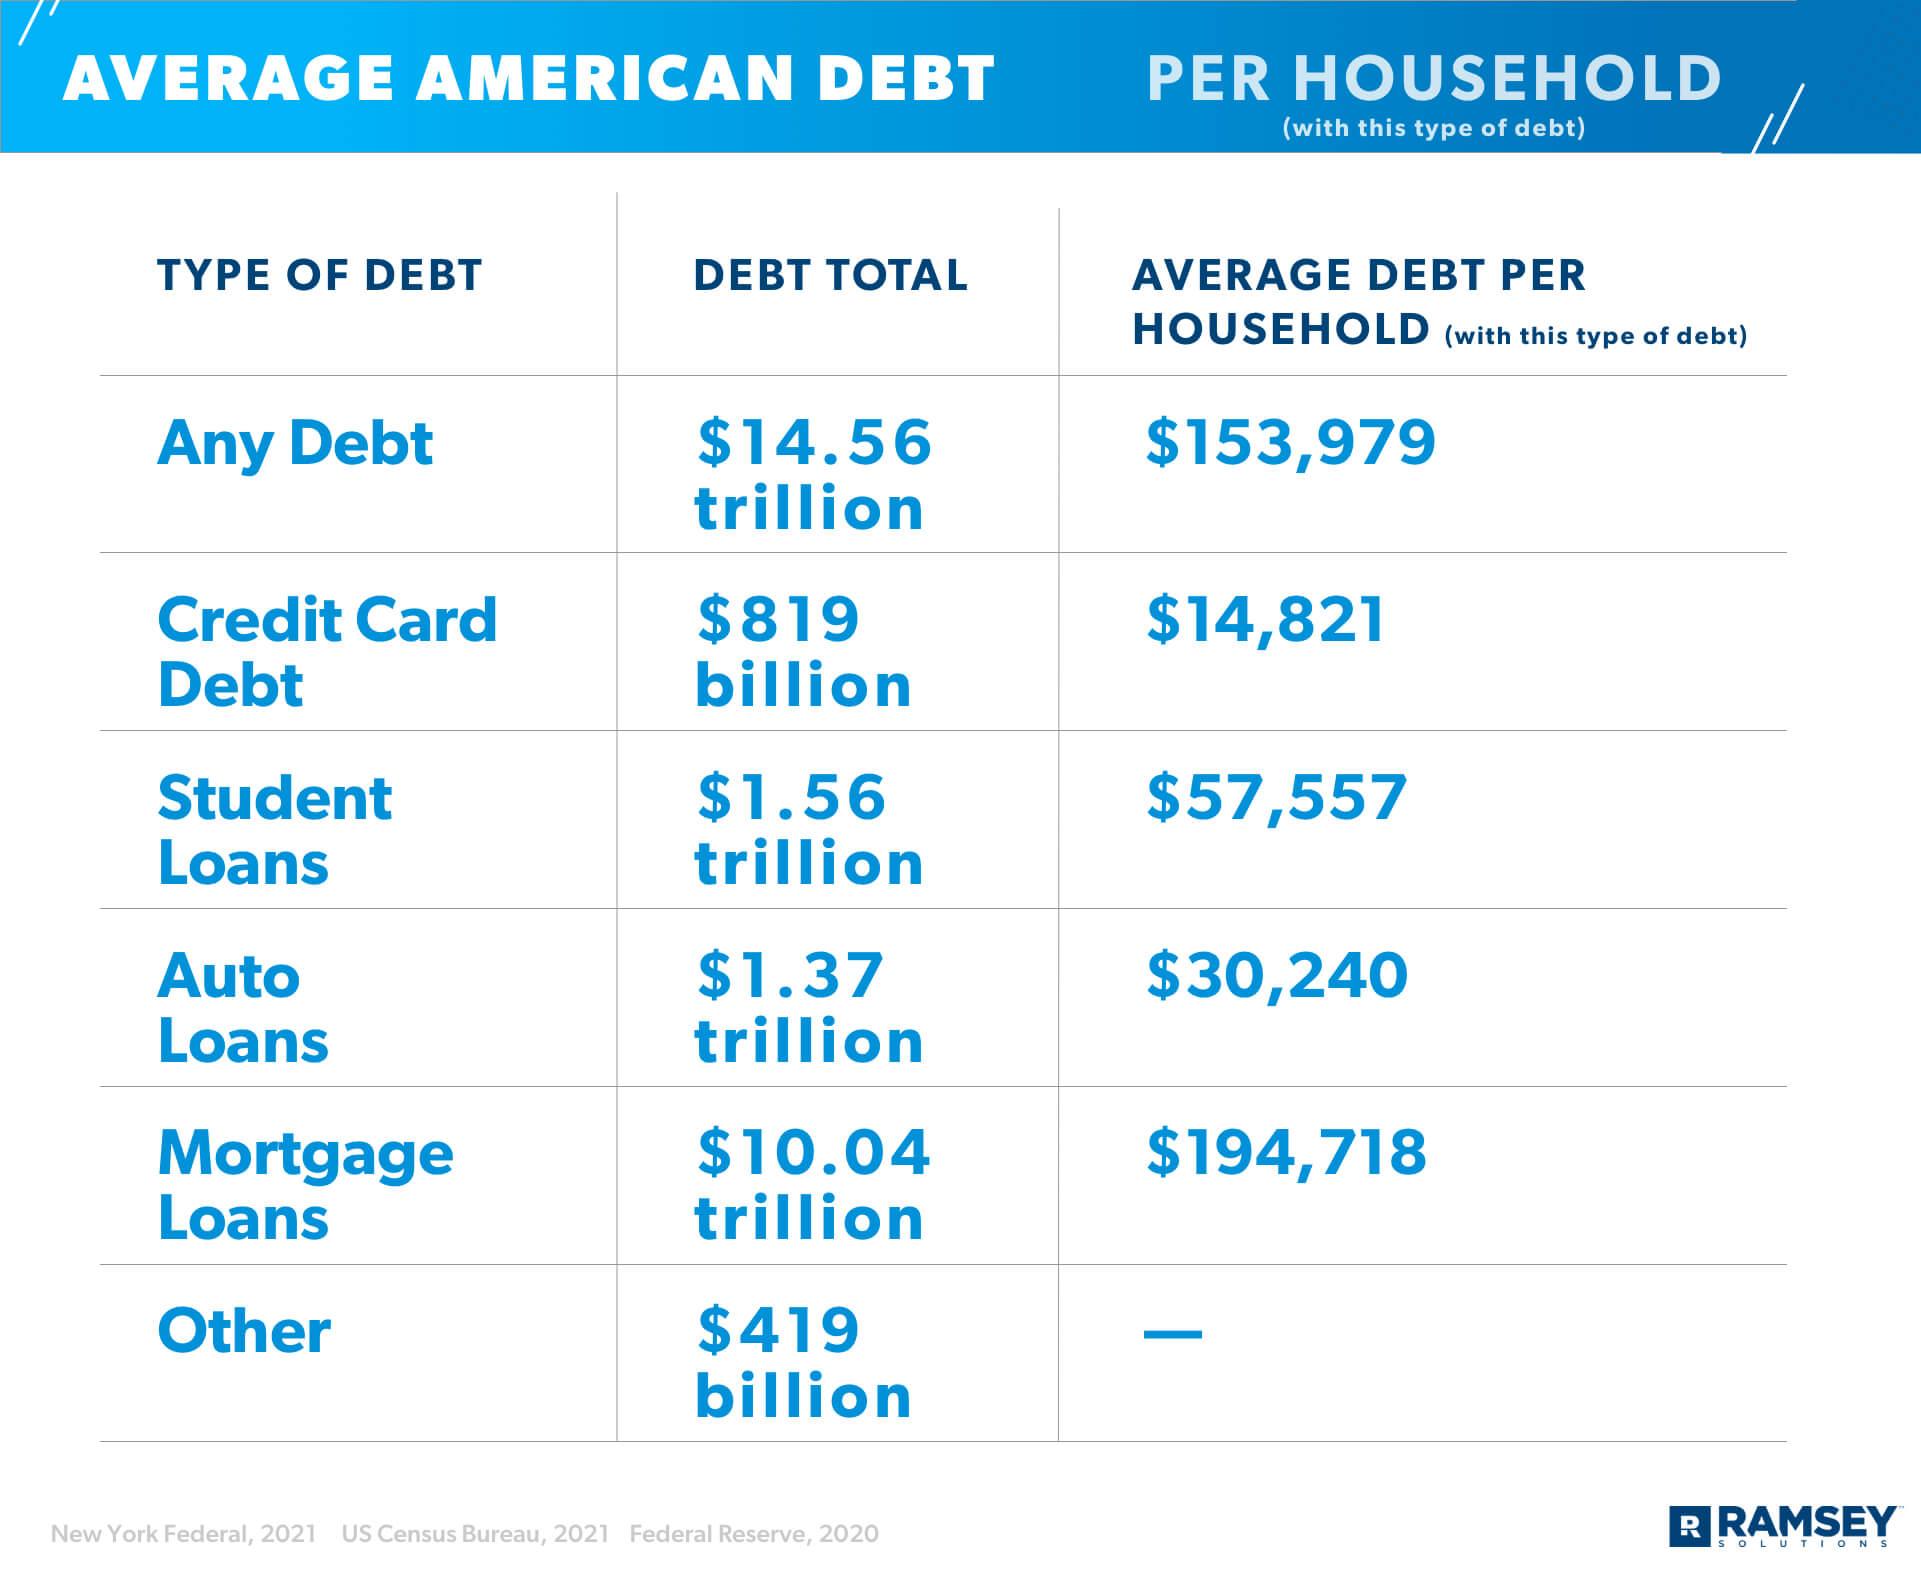 Average American Debt Per Household